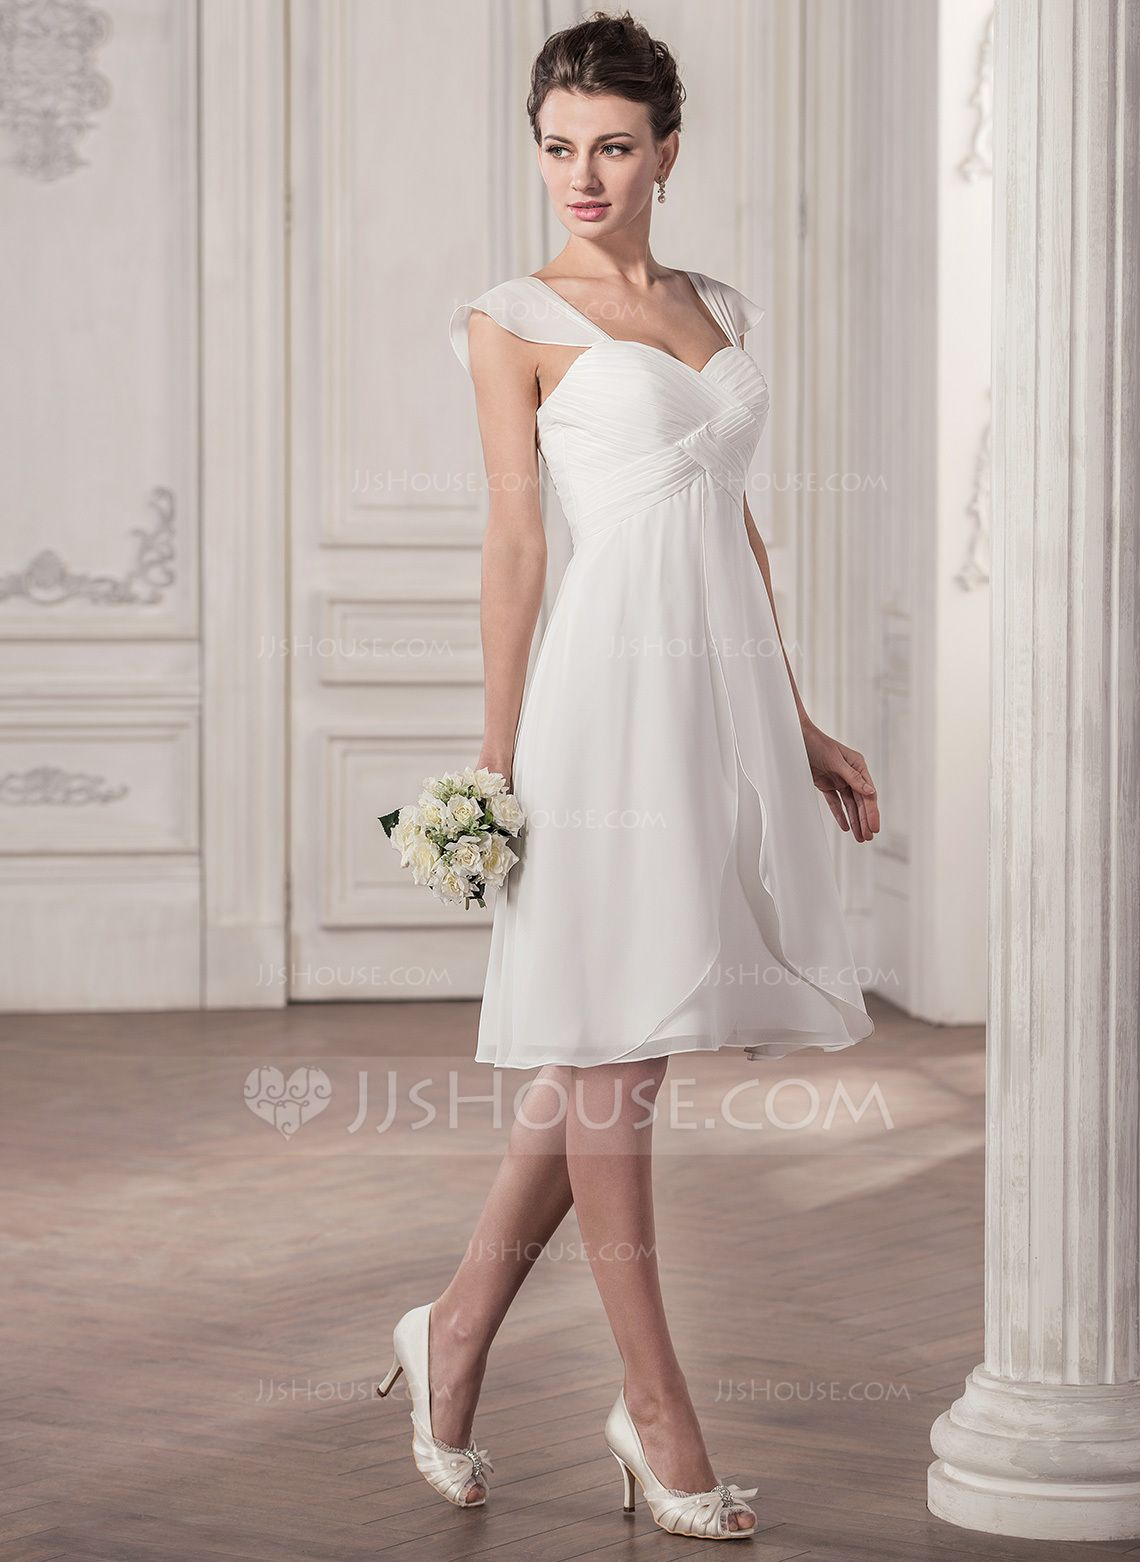 Cocktail dresses for wedding reception  ALinePrincess Sweetheart KneeLength Chiffon Wedding Dress With